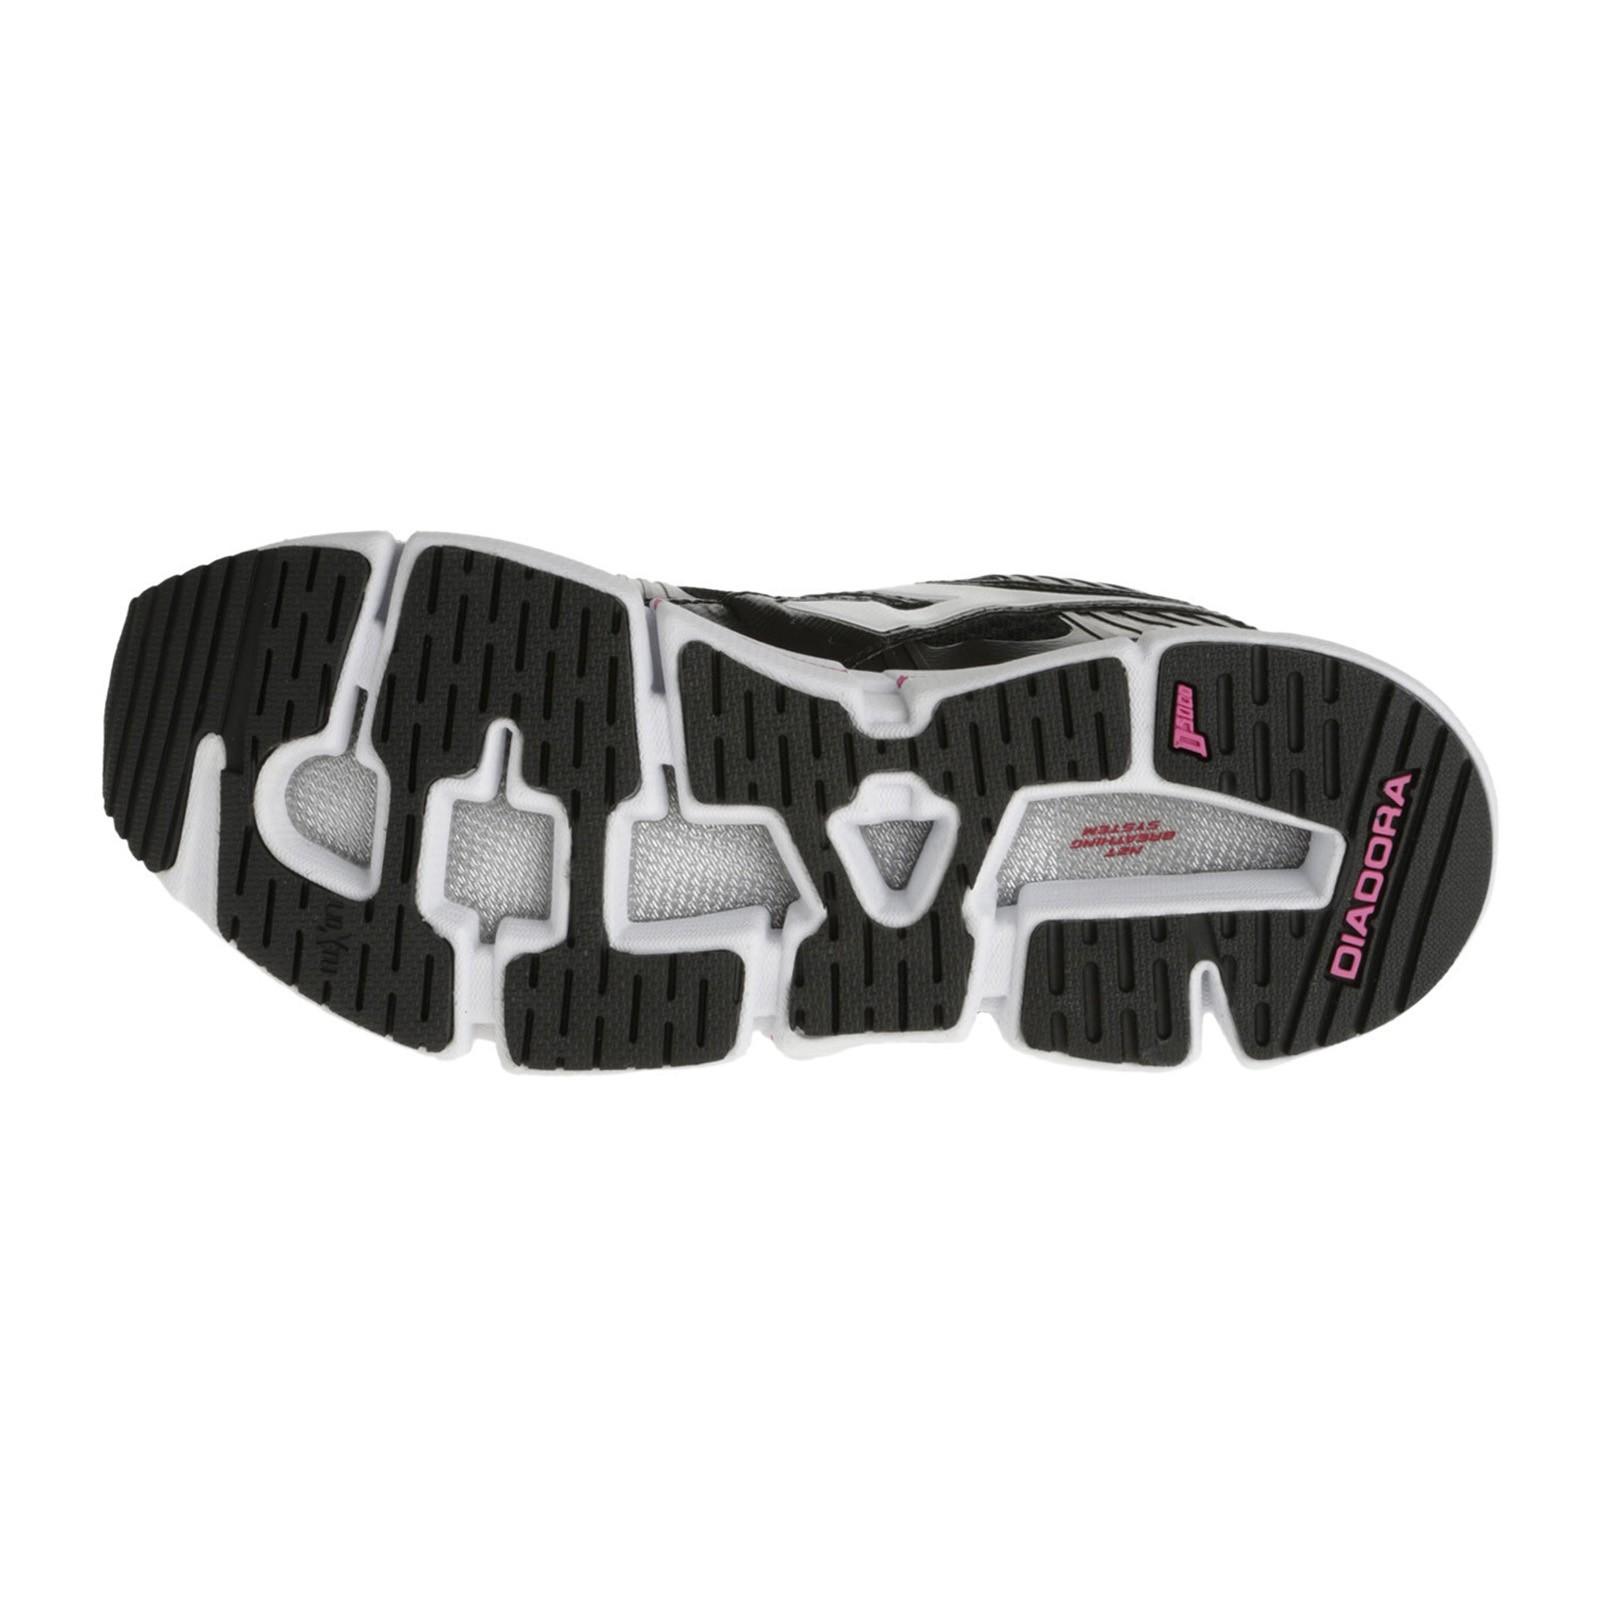 sneakers running Diadora n-5100 w - Маратонки - Бягане - Спортна ... a4023db1621